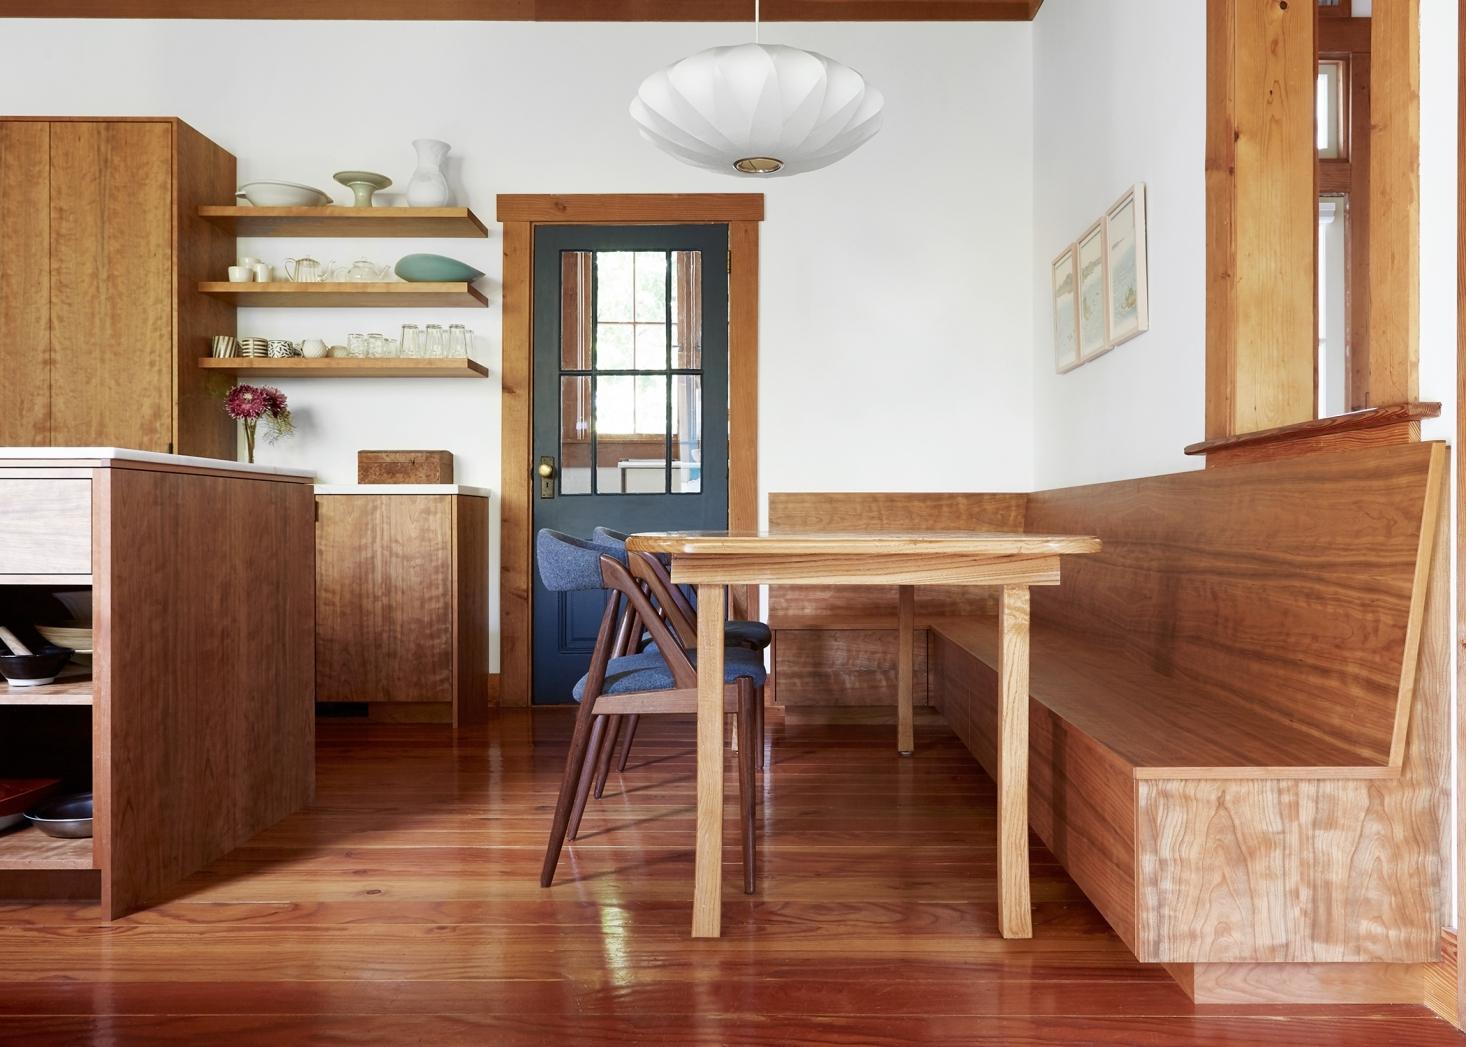 wood kitchen oakand aya brackett remodel built in bench 1 1466x1047